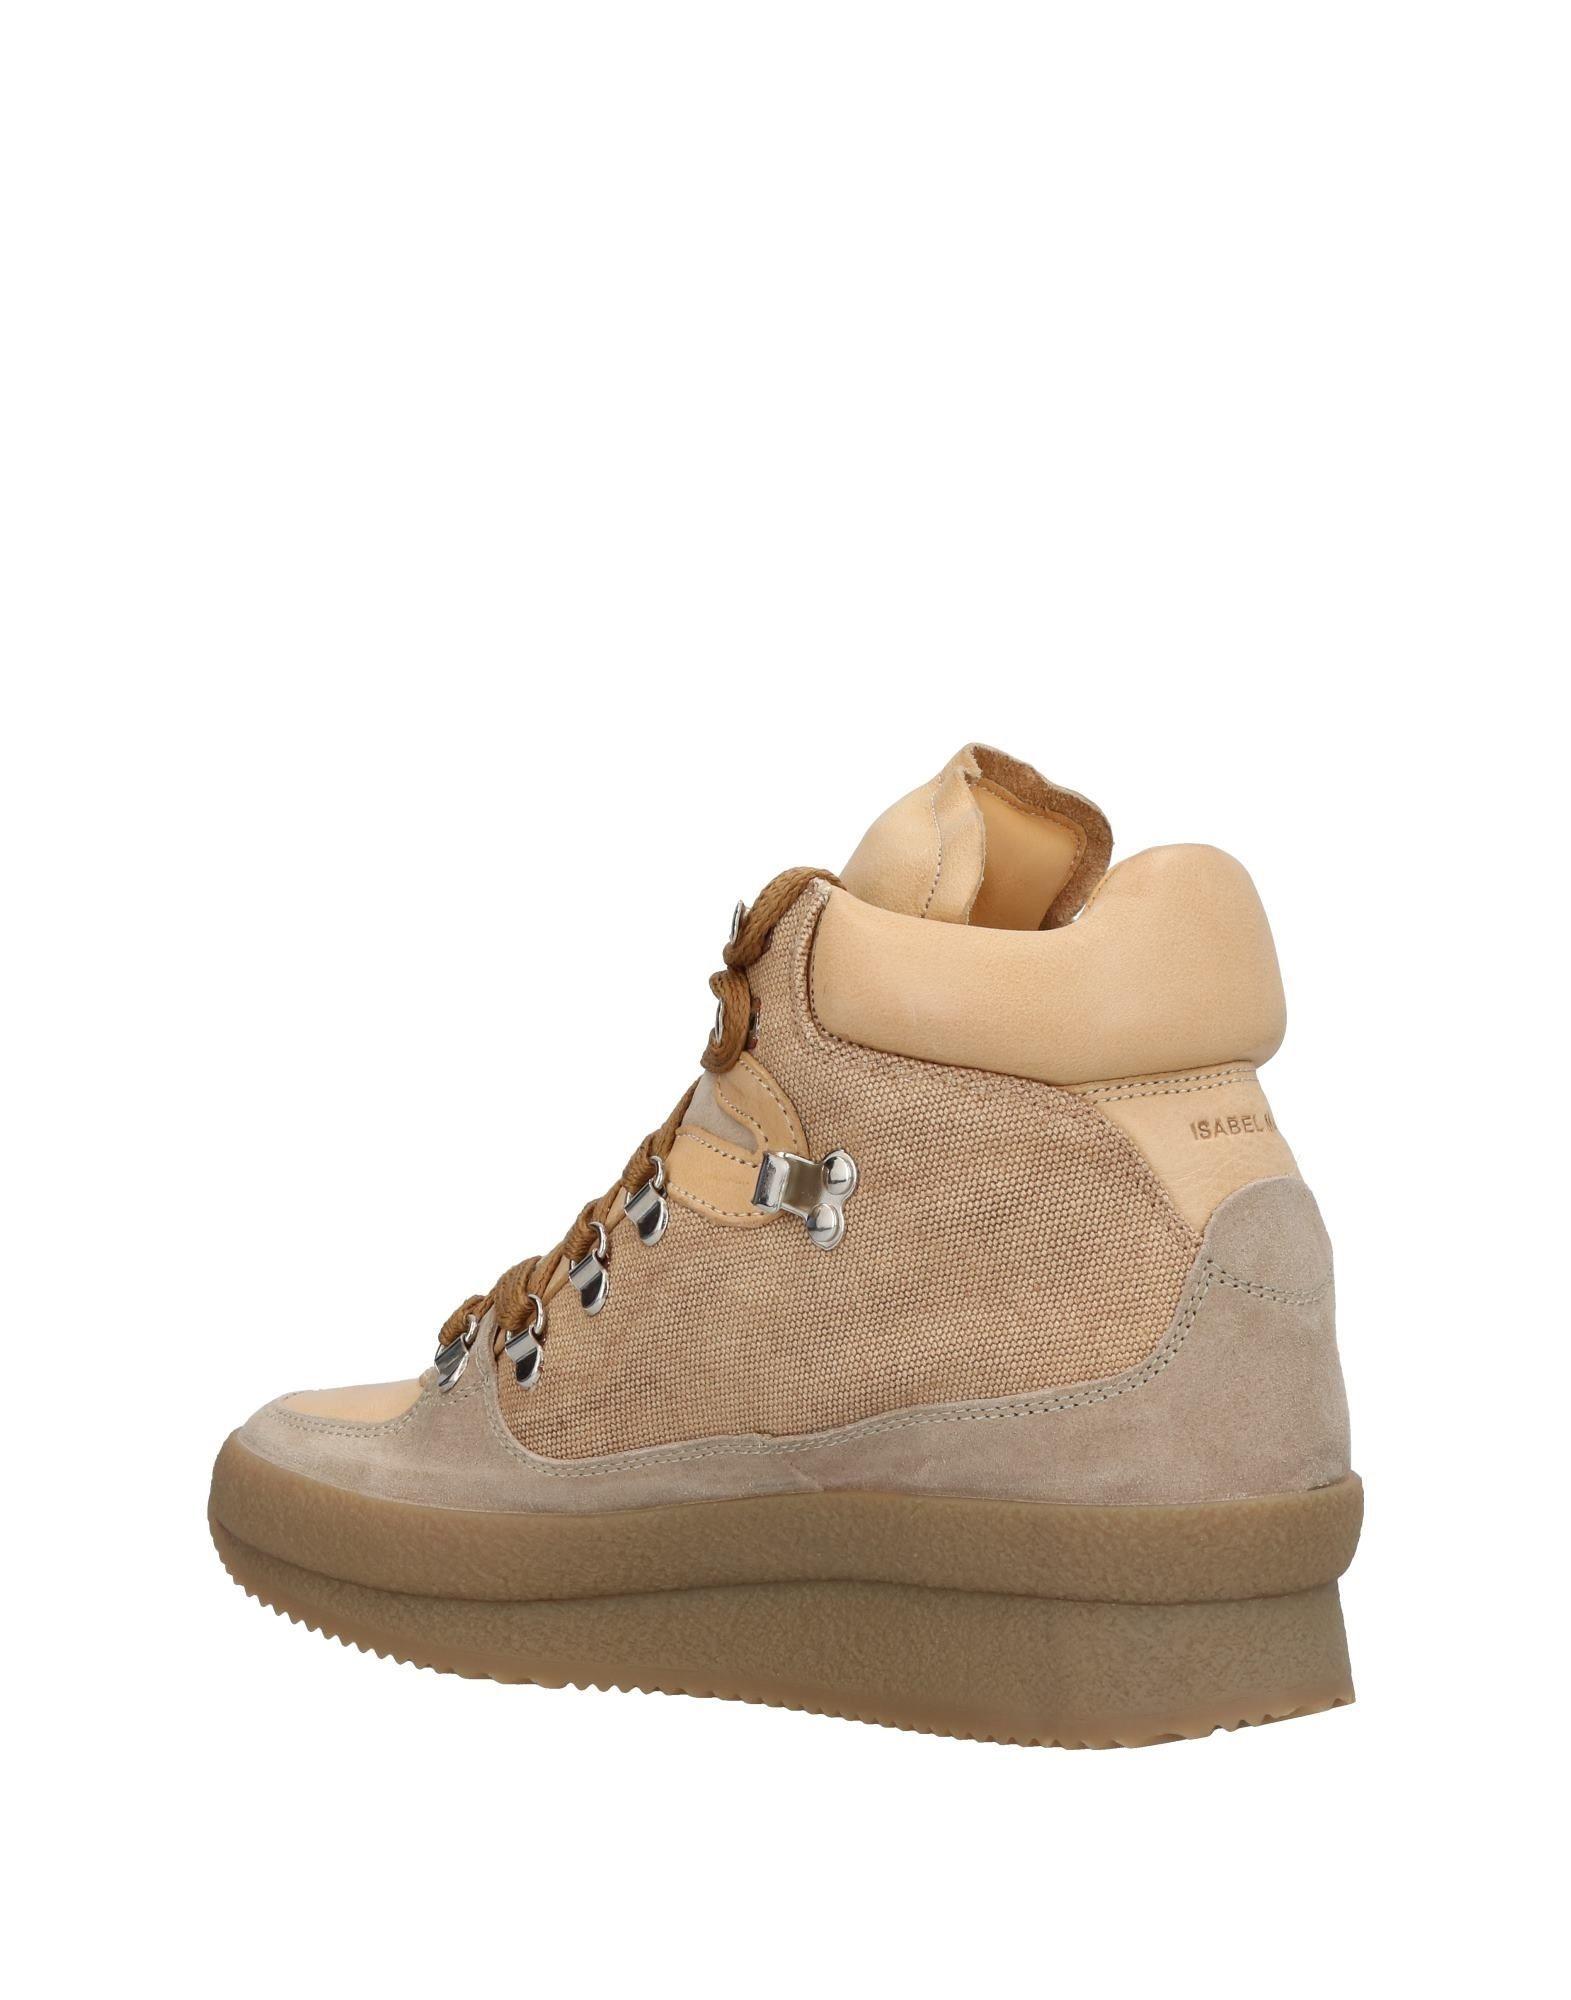 Isabel Marant Etoile Beige Leather Sneakers